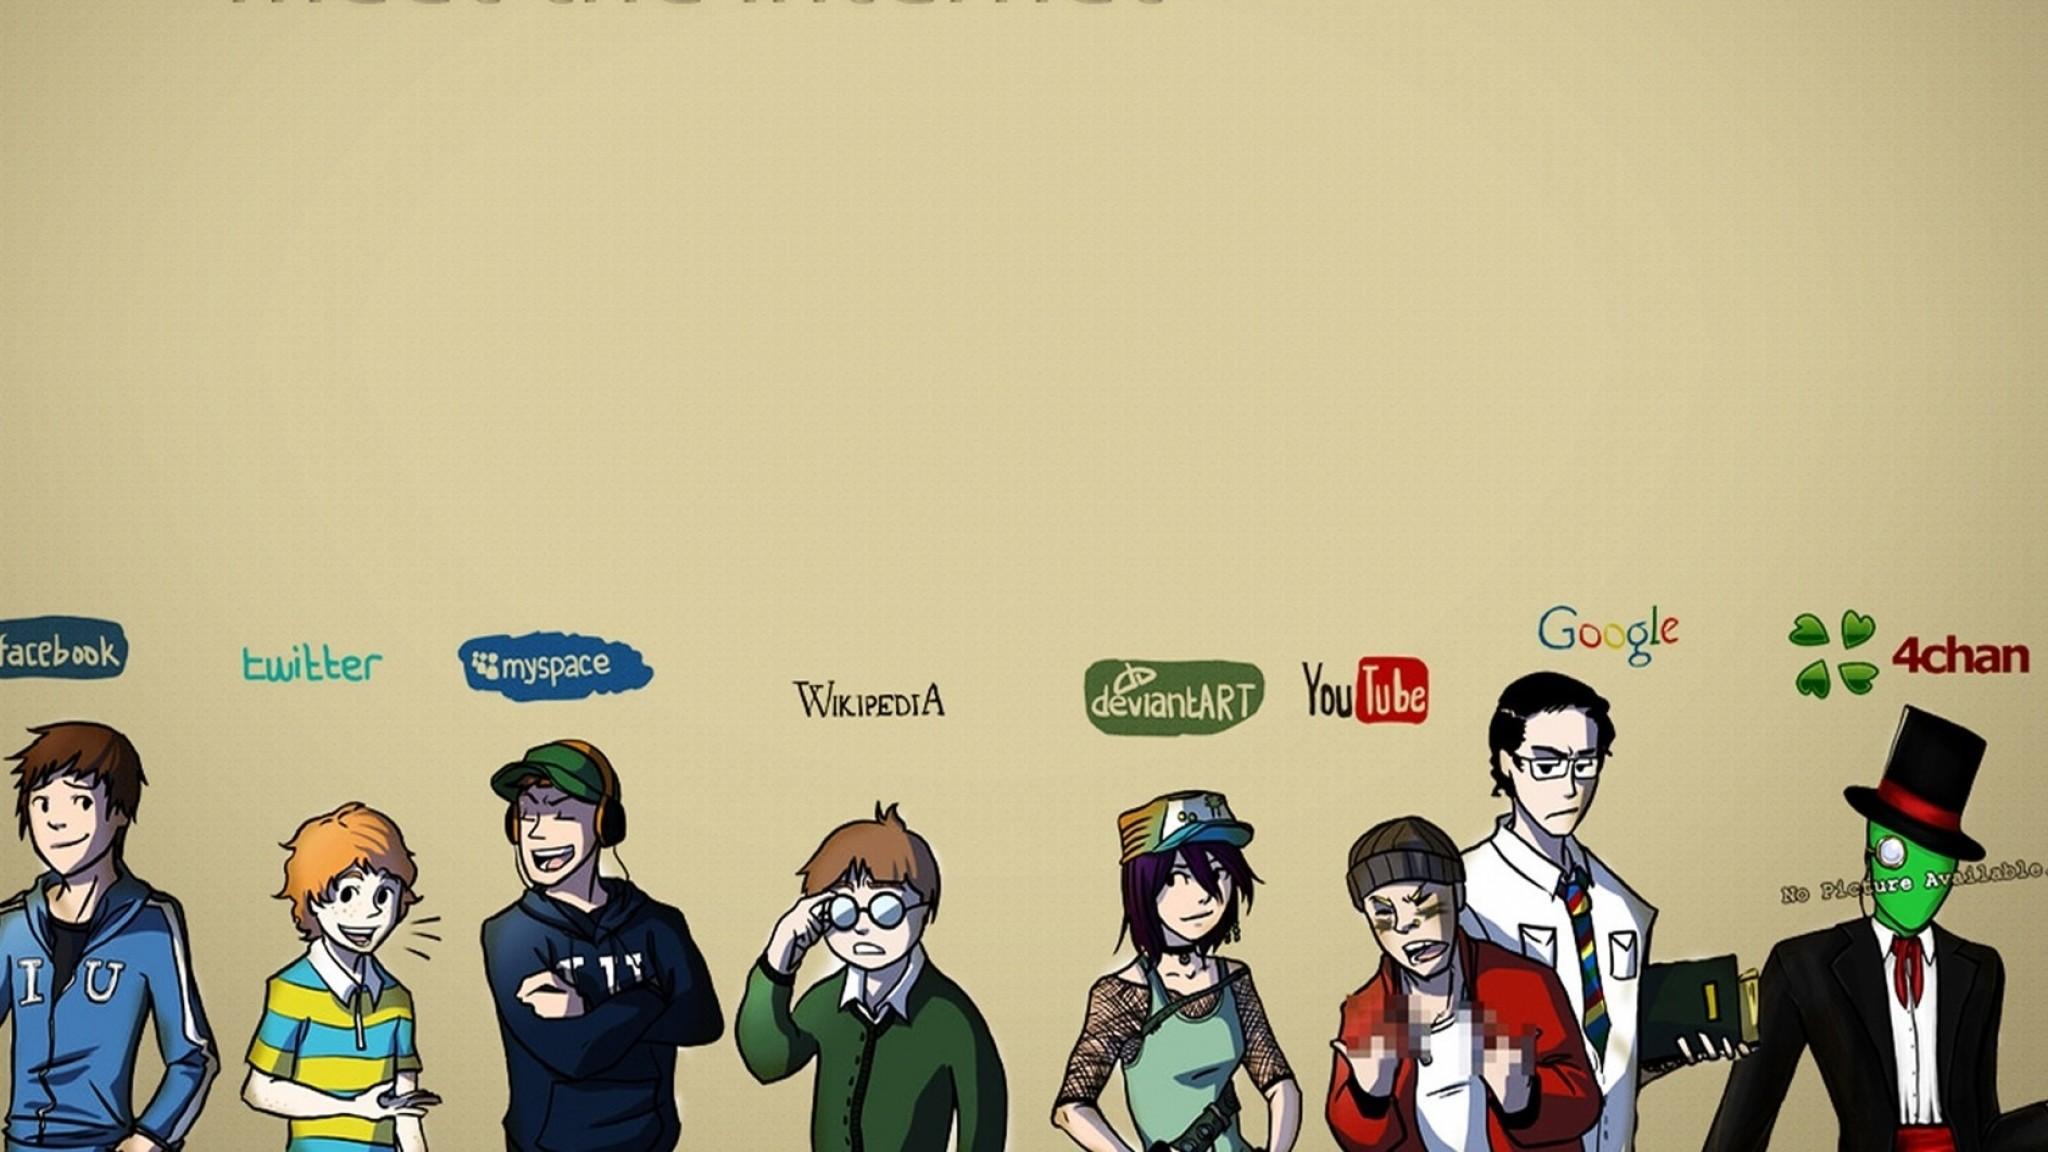 Wallpaper internet, facebook, twitter, myspace, wikipedia,  deviantart, youtube,